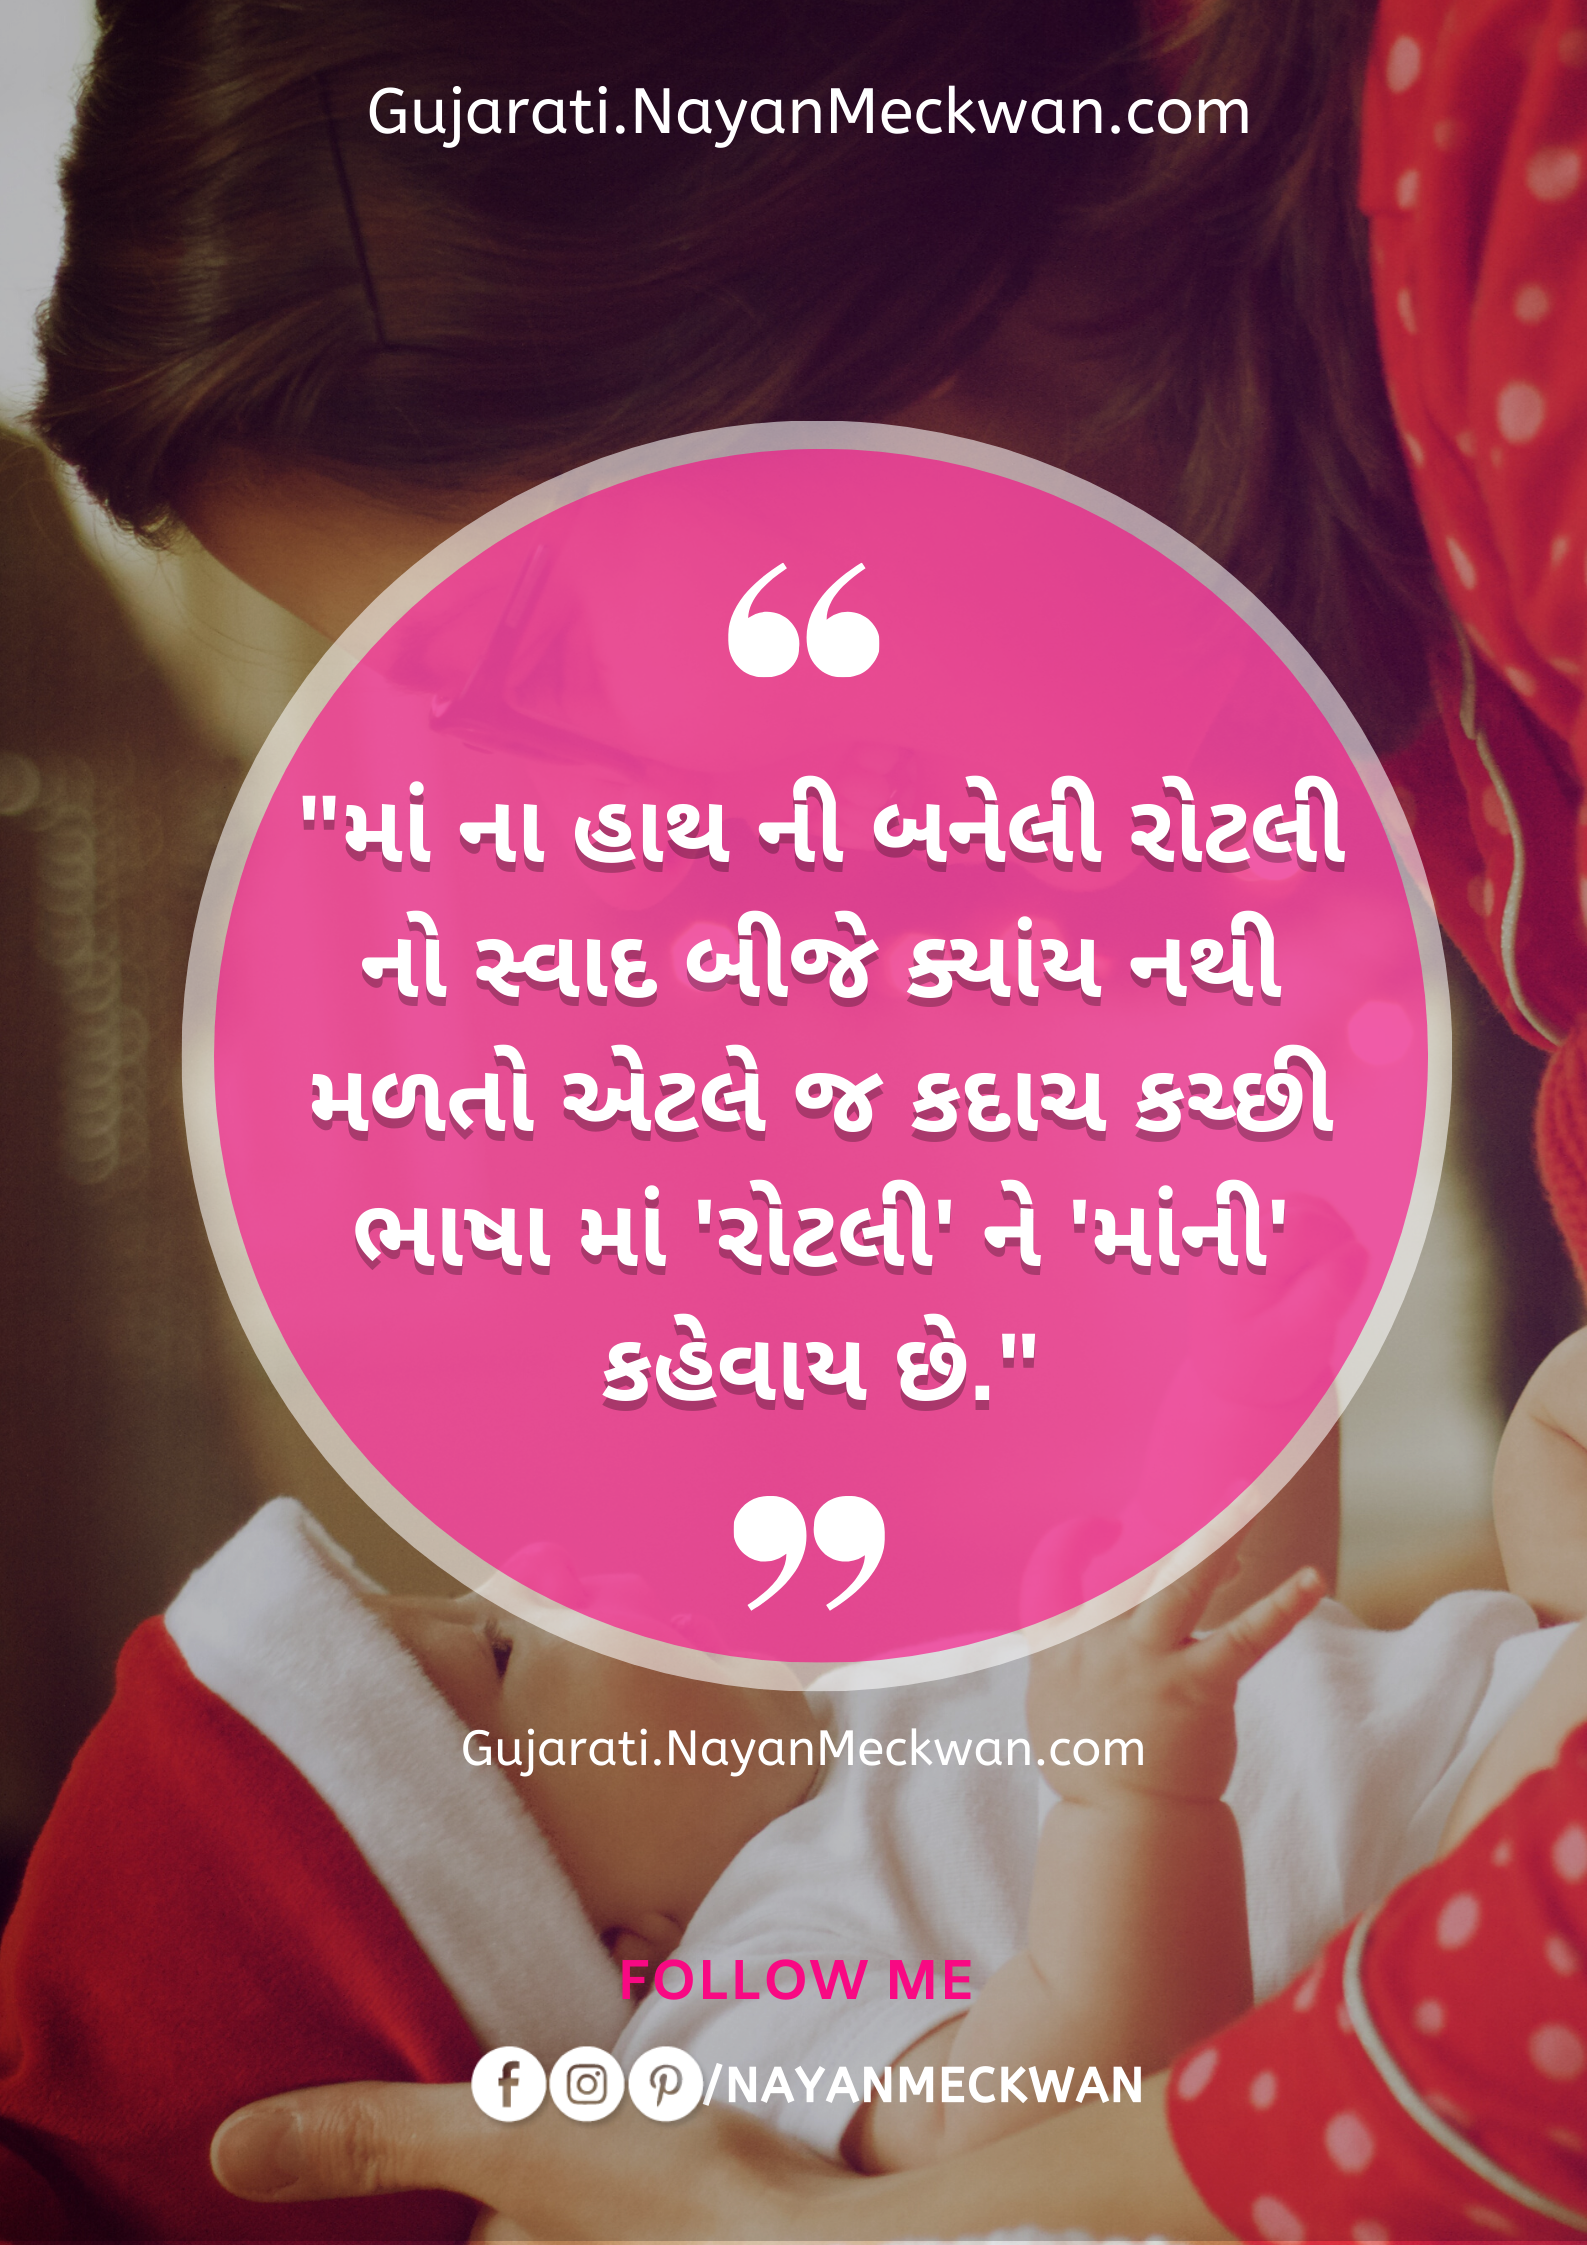 Good Morning Gujarati Suvichar (ગુજરાતી સુવિચાર ) Pictures